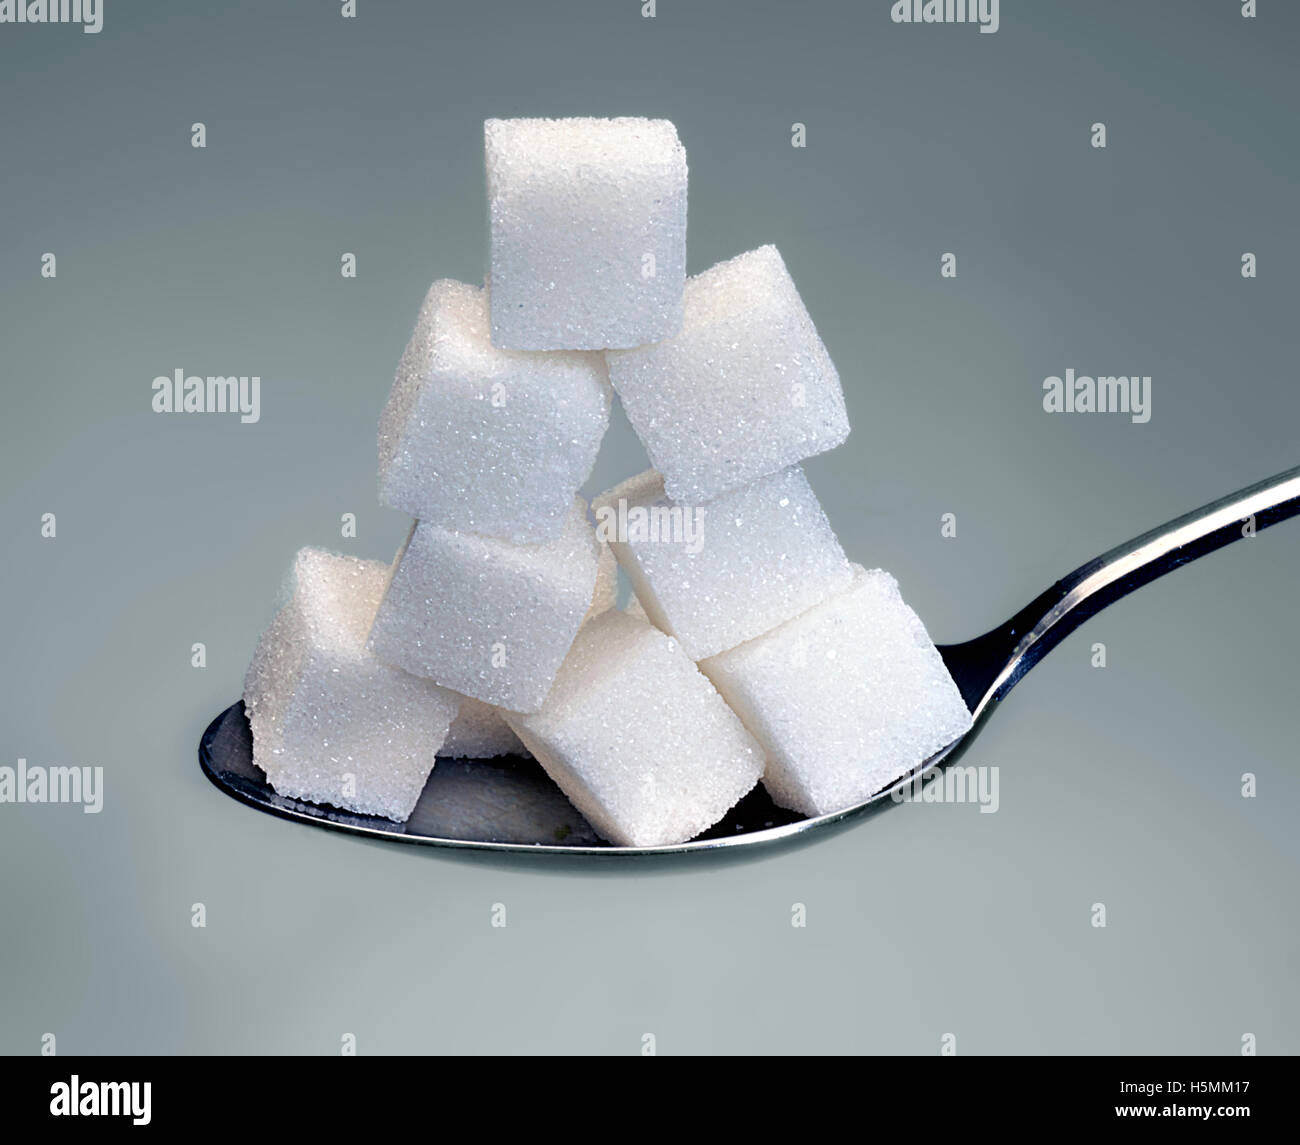 sugar - Stock Image